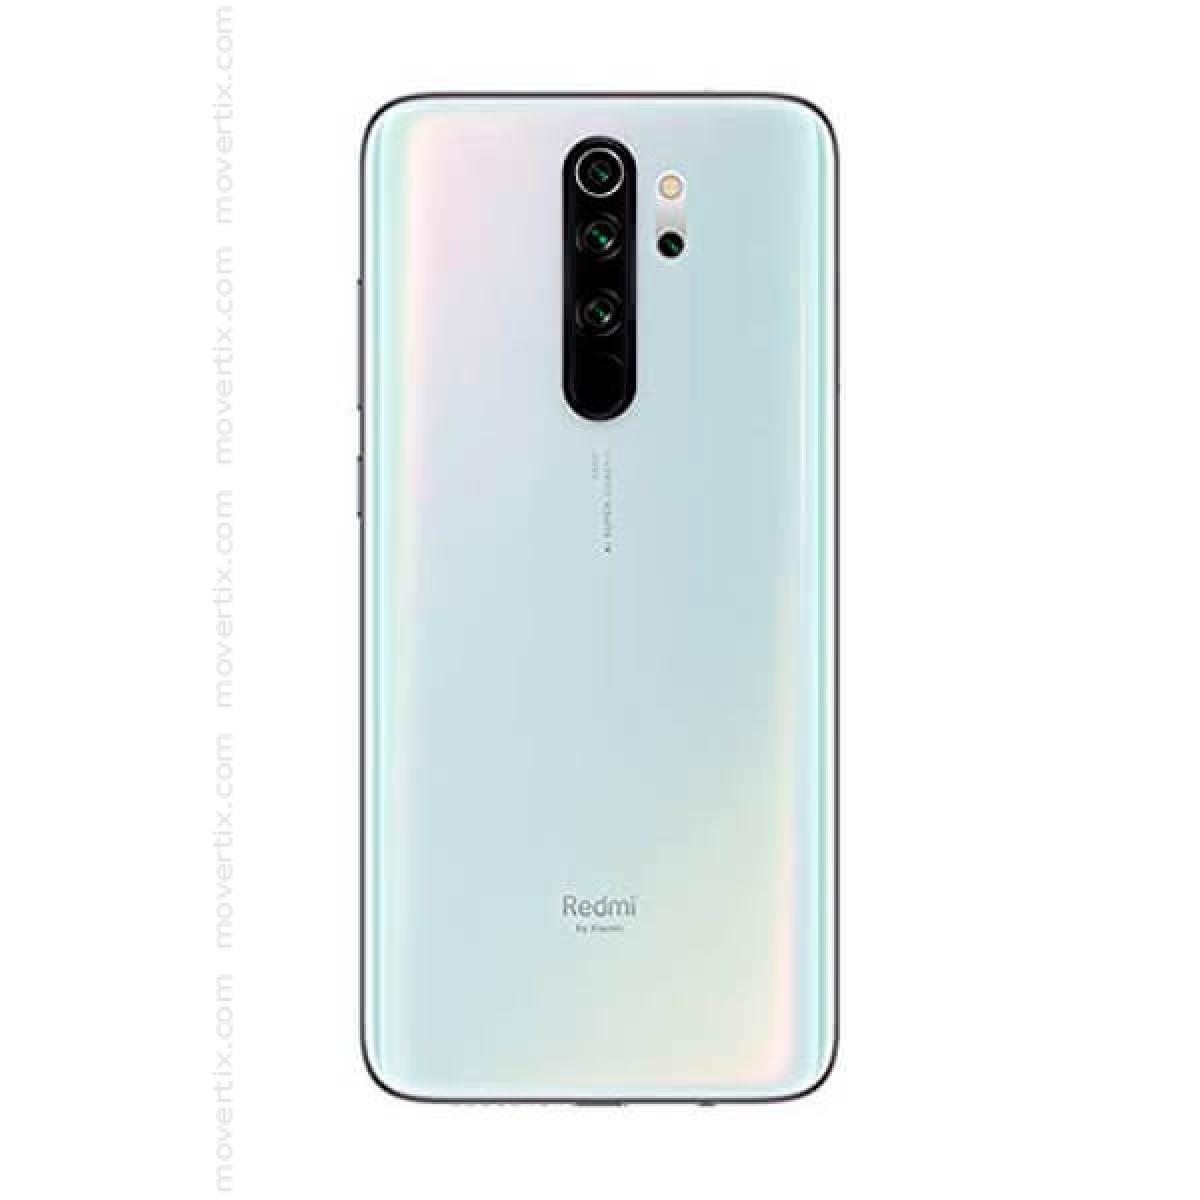 Xiaomi Redmi Note 8 Pro Dual Sim Pearl White 128gb And 6gb Ram